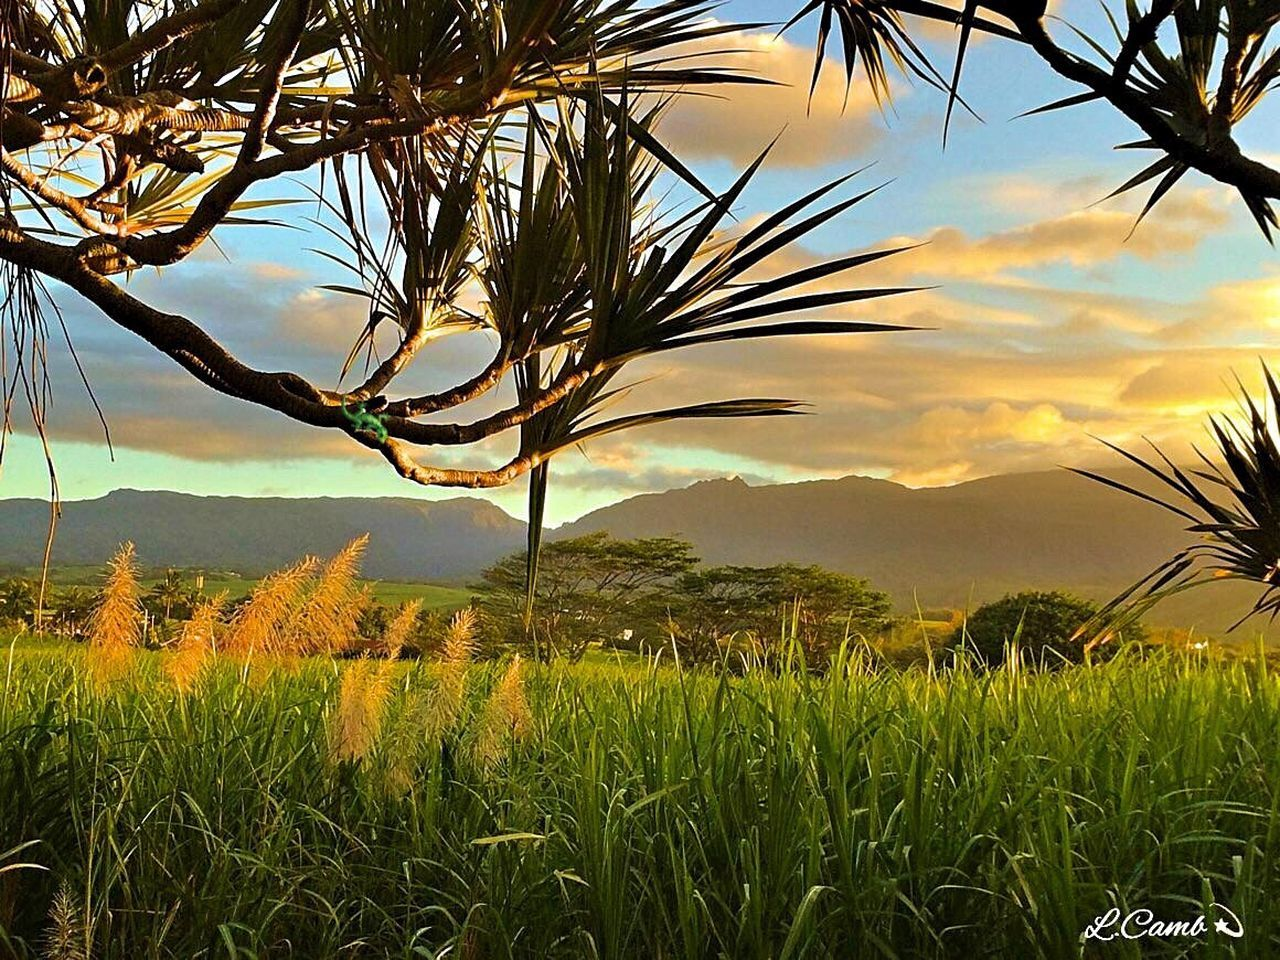 Champ de canne à sucre Ileintense Flower Nature Ile Intense Savane Landscape Braspanon Lareunion974 Canneasucre Sunset Vacoa